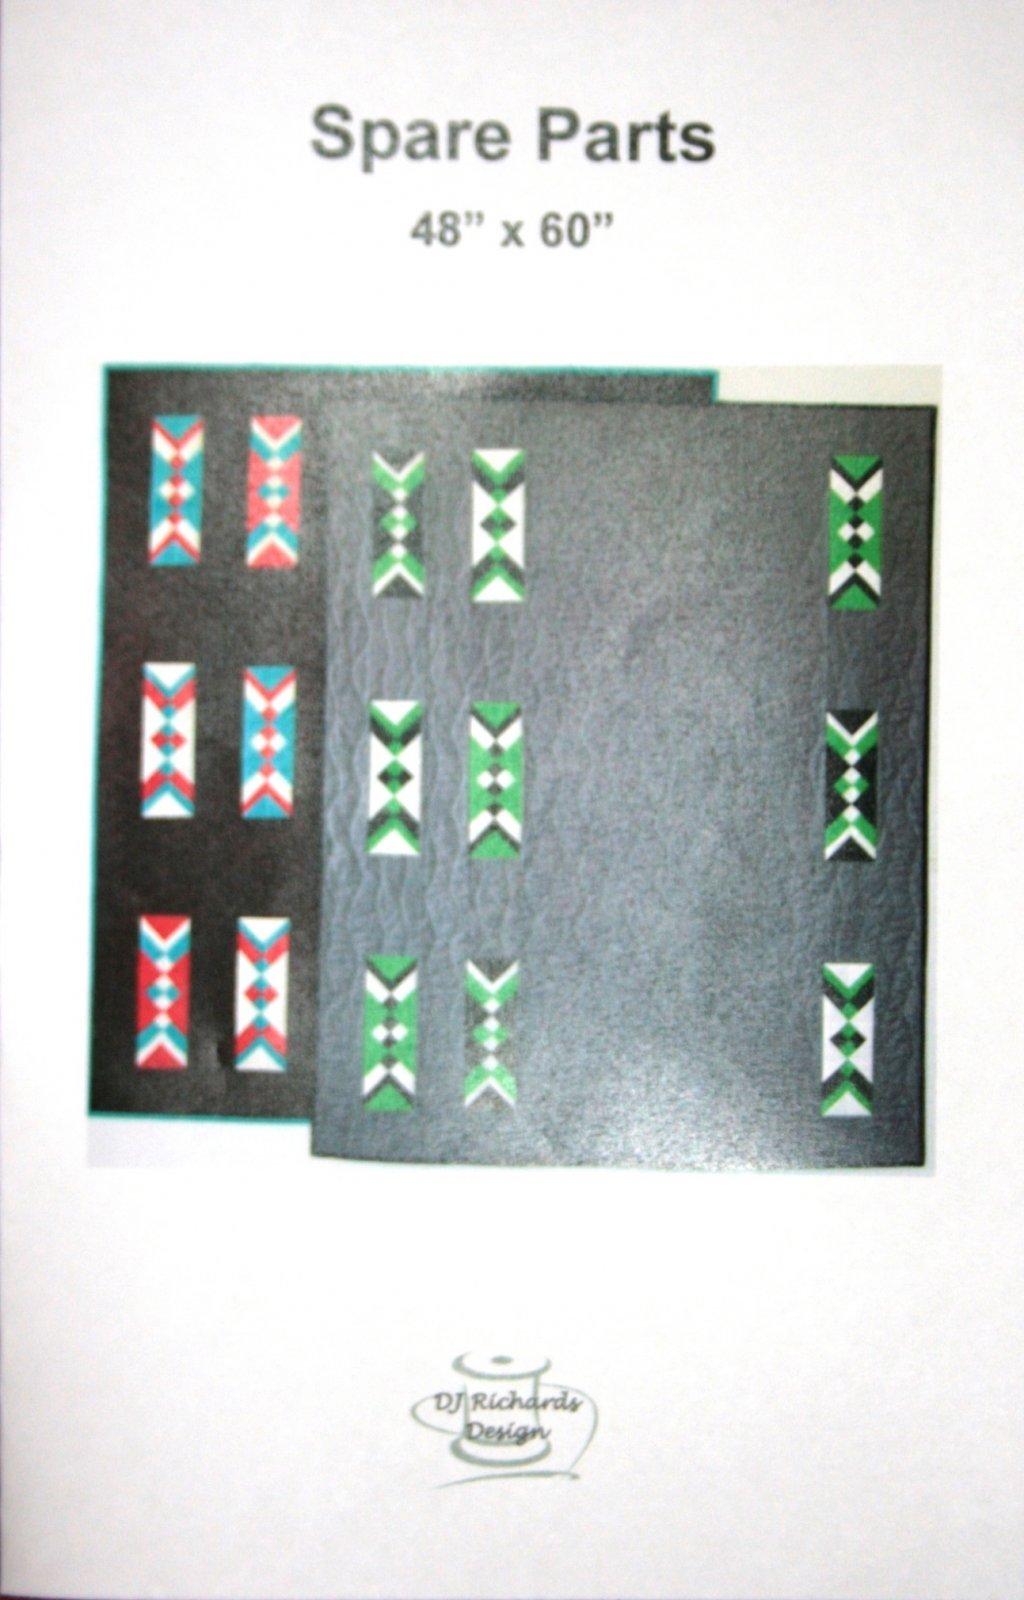 DJ Richards, Spare Parts quilt pattern